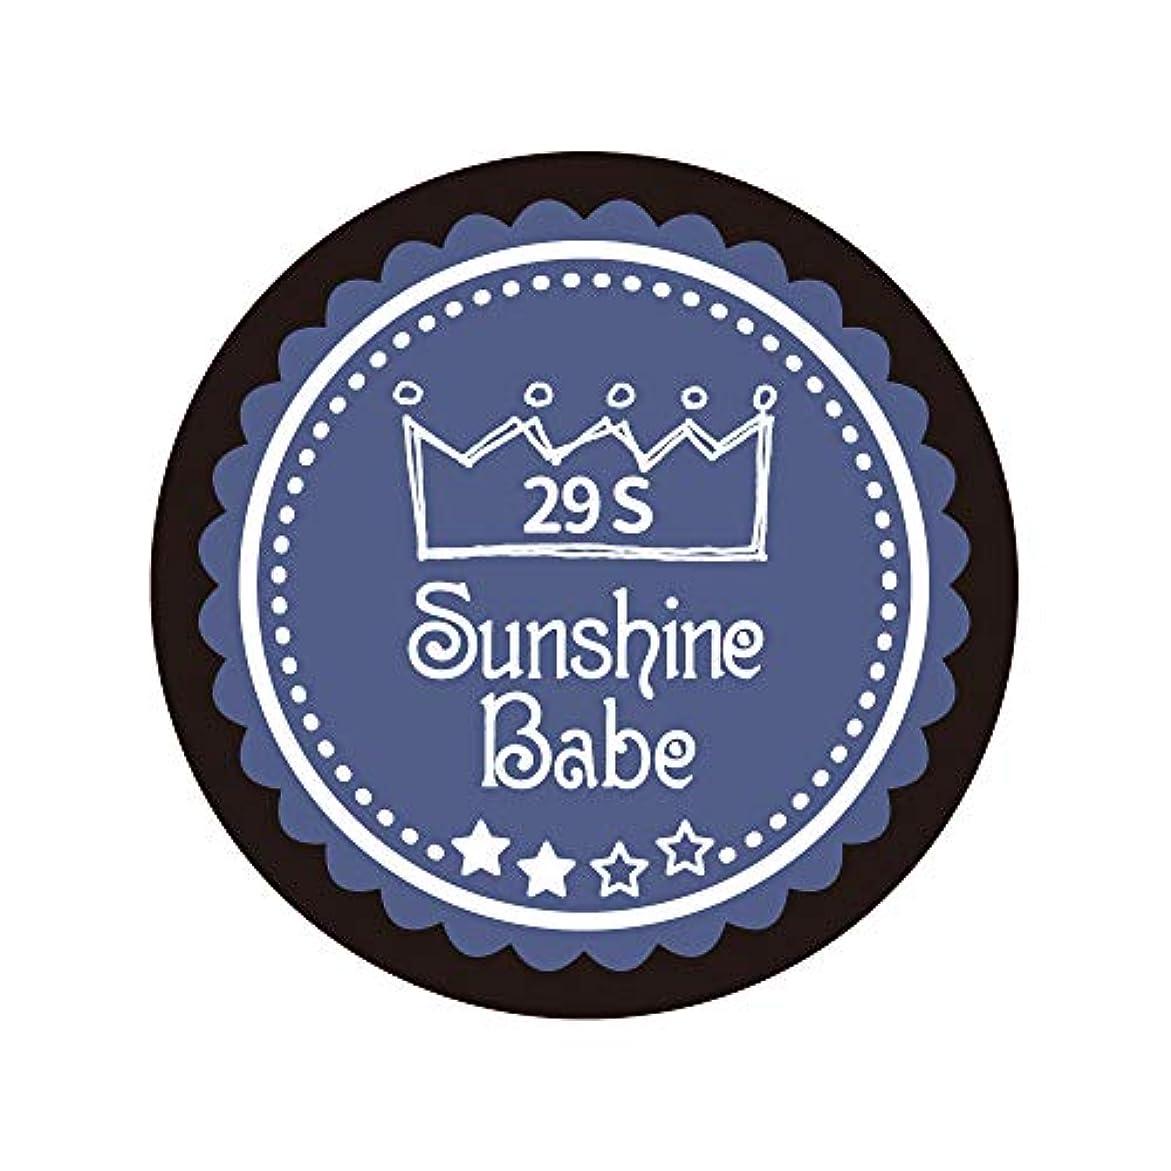 Sunshine Babe コスメティックカラー 29S ネイビーグレー 4g UV/LED対応